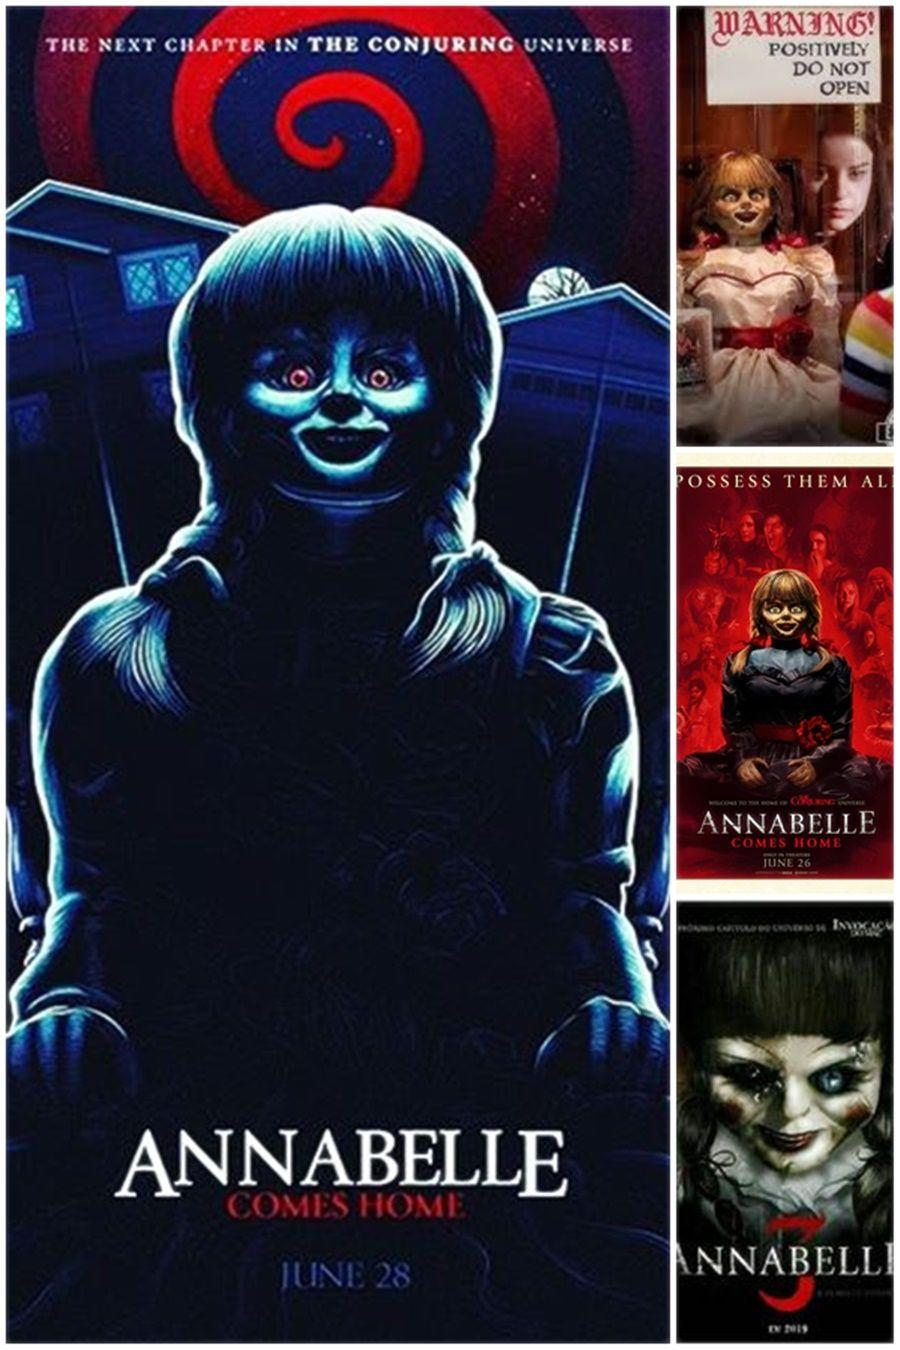 Ver Annabelle 3 Vuelve A Casa 2019 P E L I C U L A Hd Completa Horror Movie Characters Horror Movie Art Horror Movie Posters